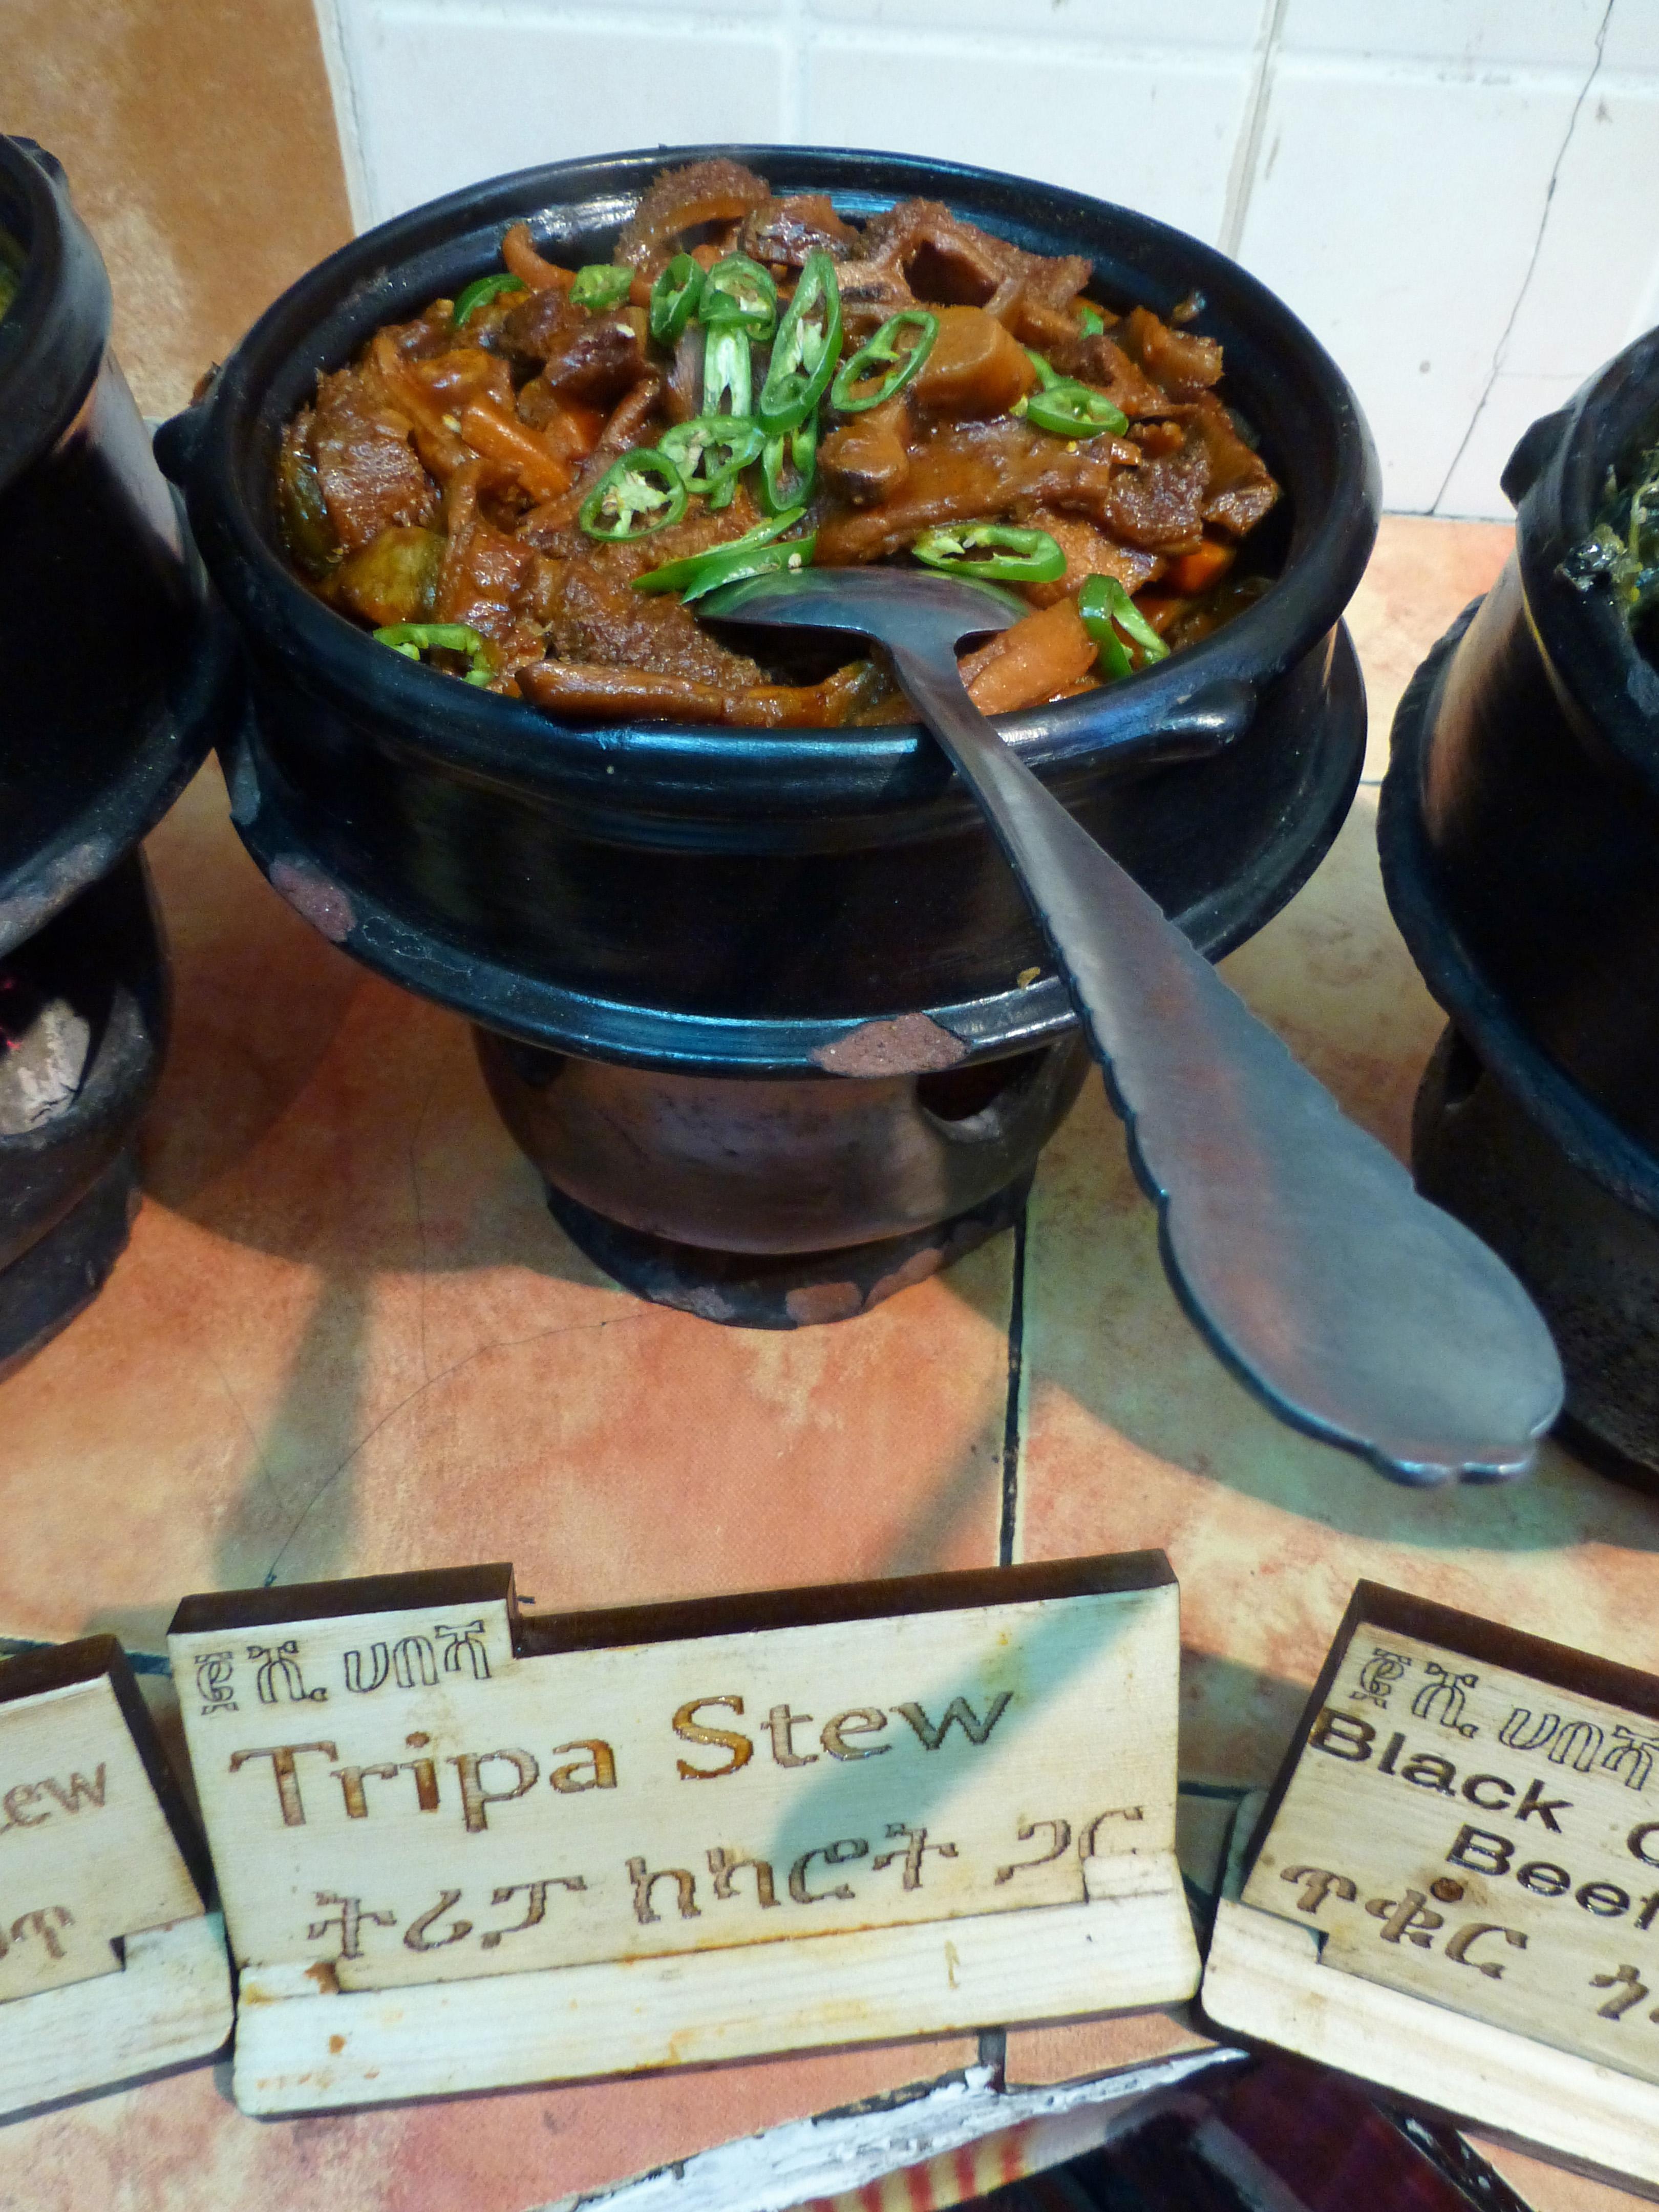 FileAddisAbebaCuisine éthiopienne Jpg Wikimedia Commons - Cuisine ethiopienne